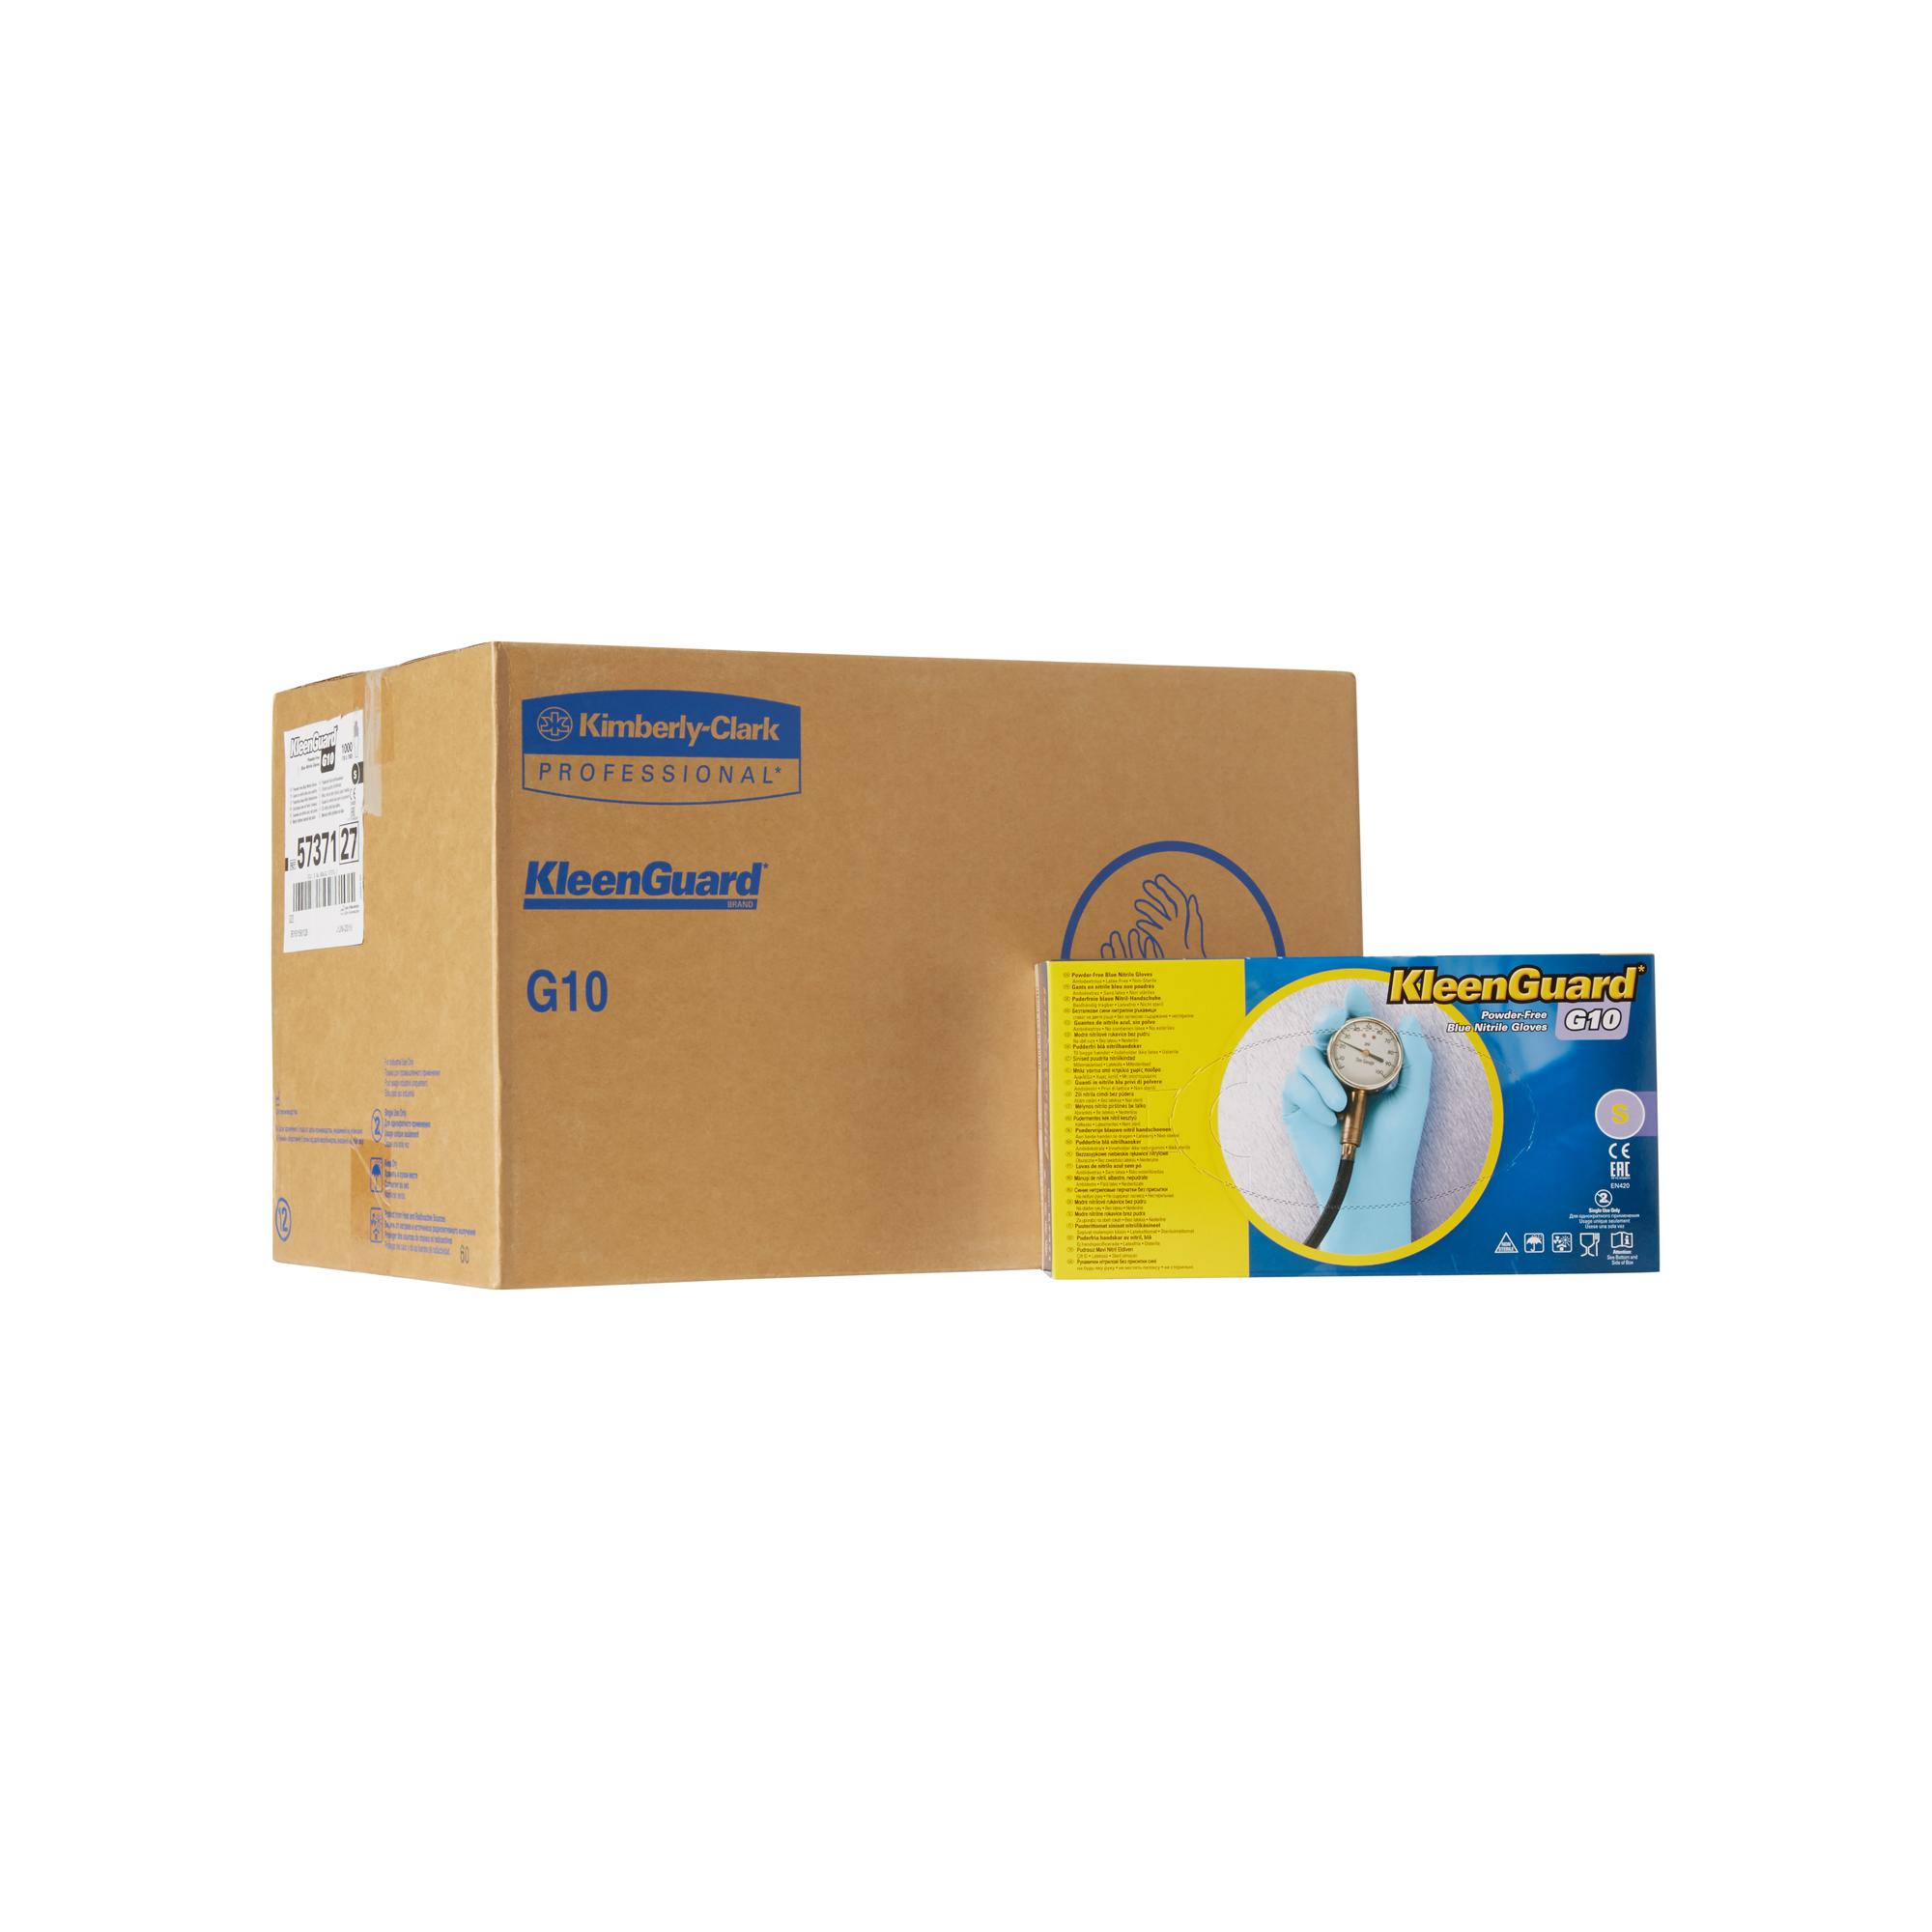 Rukavice KleenGuard* G10 NITRIL, modré, S, 1000 ks